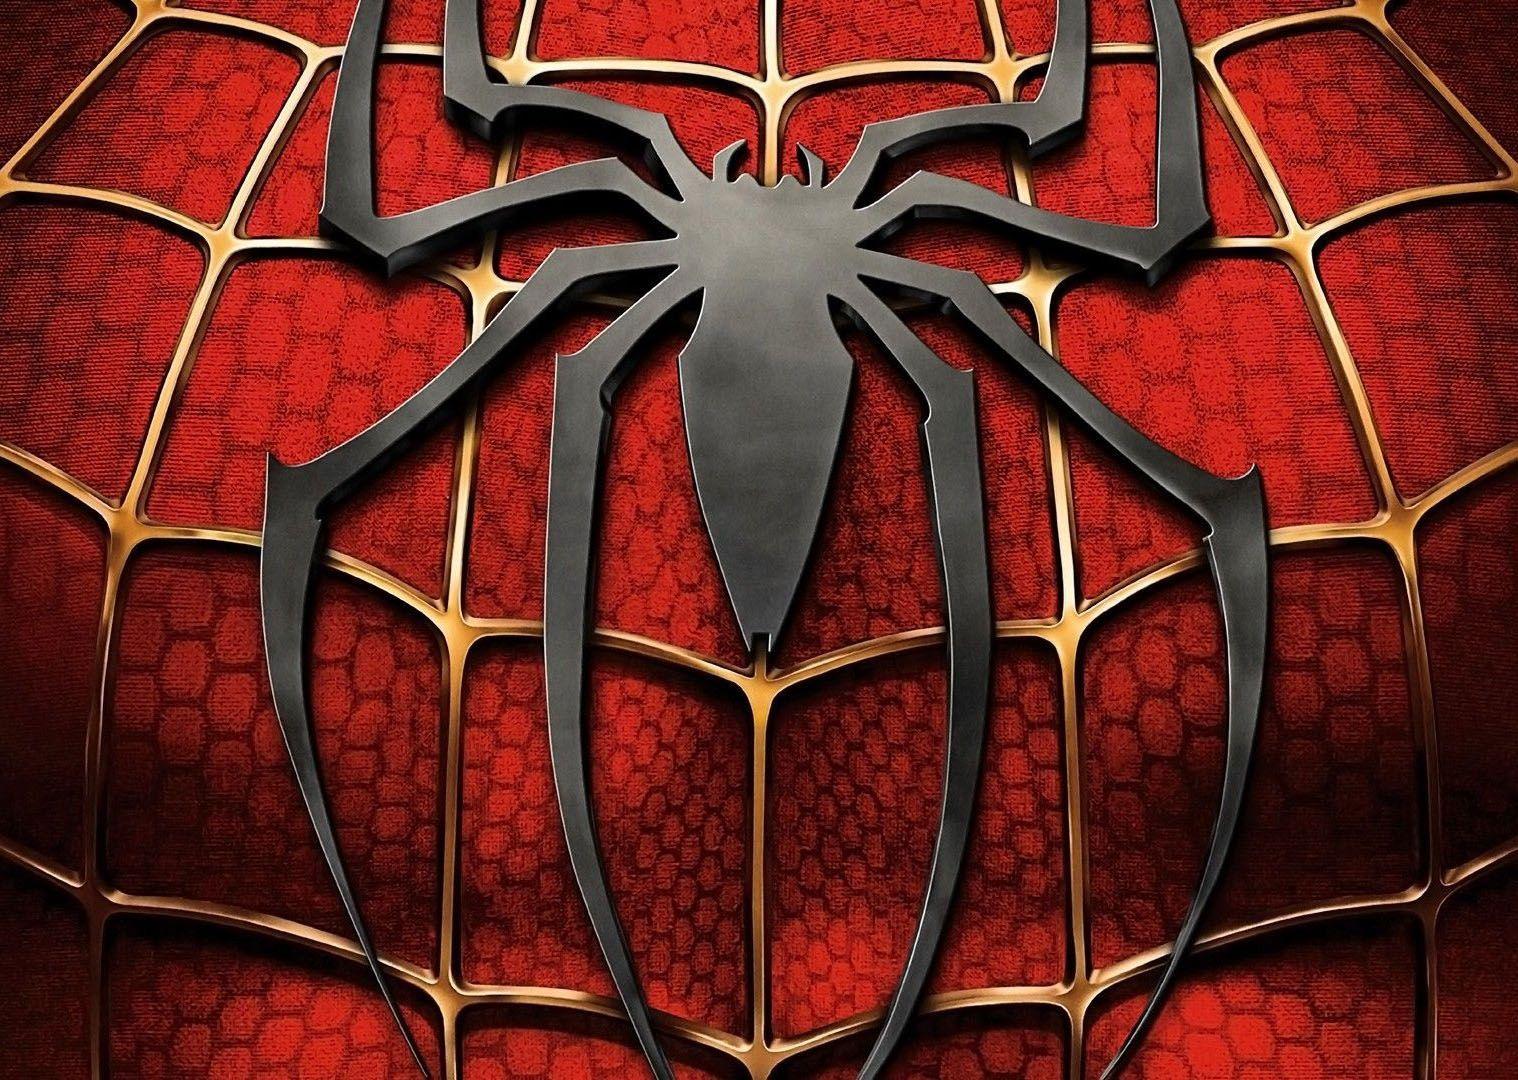 Spiderman Logos Spiderman Spiderman Images Amazing Spiderman